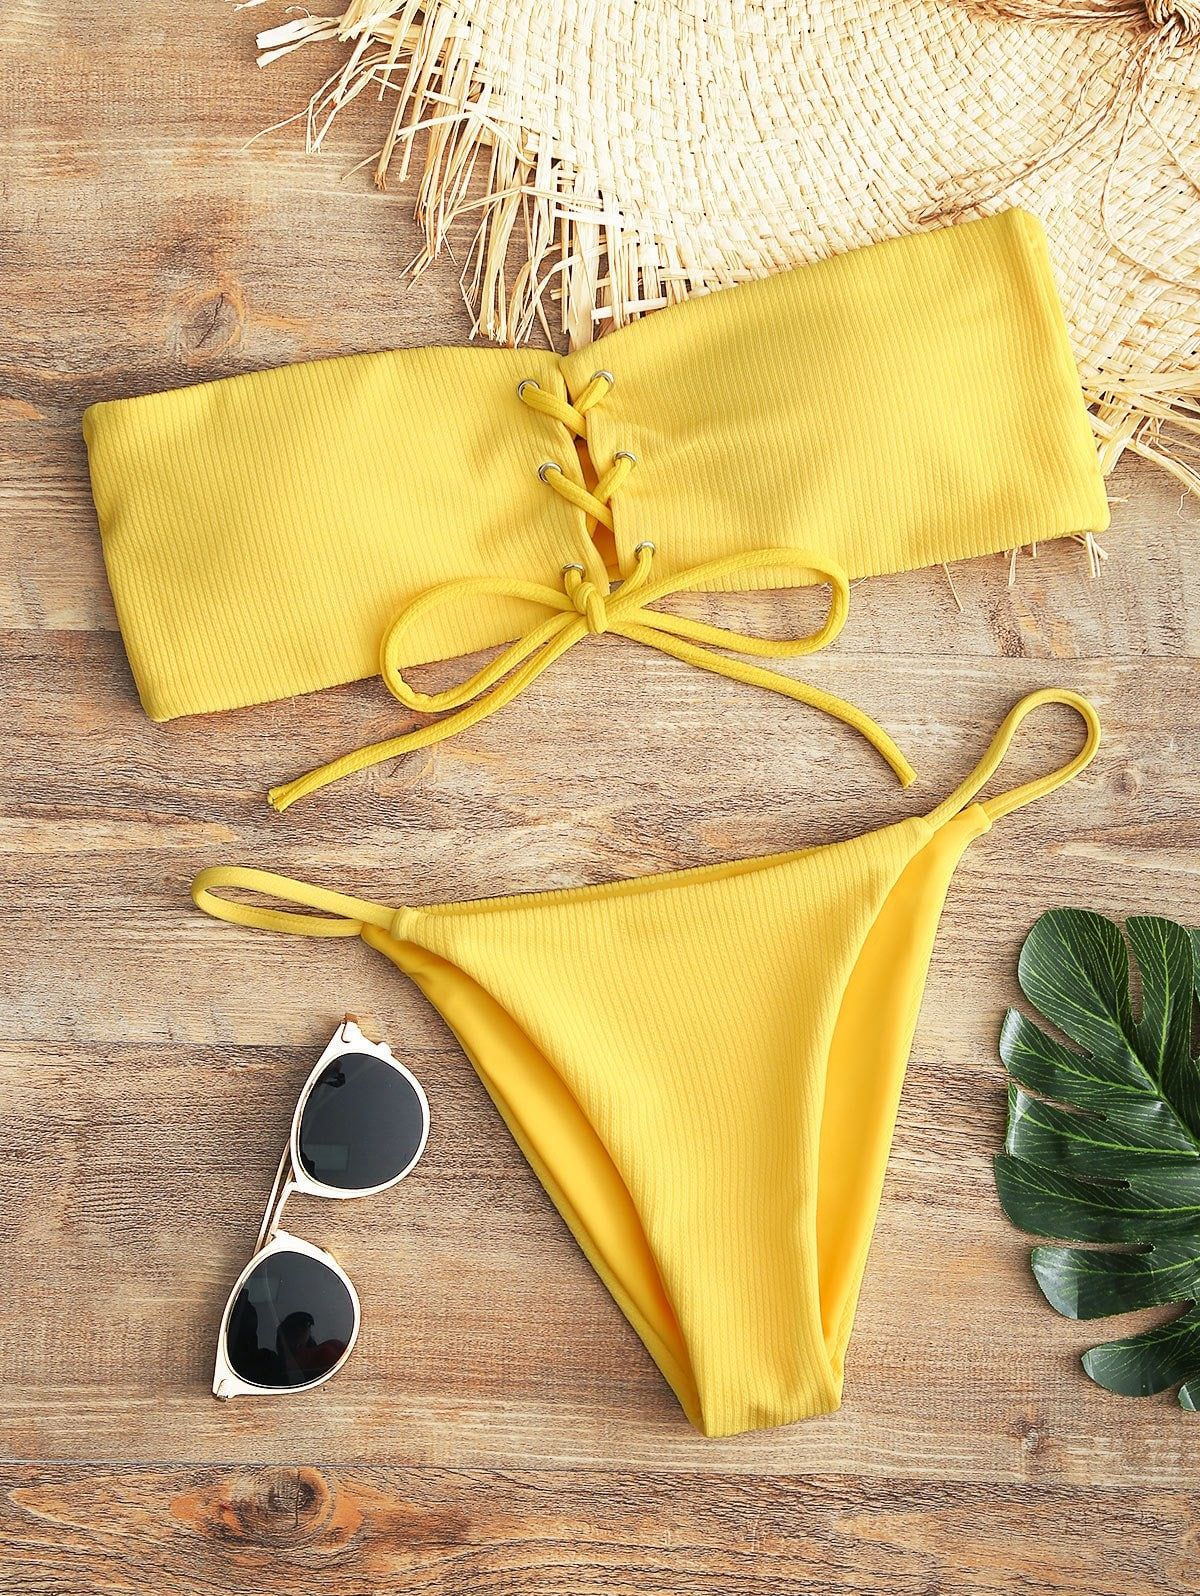 f6549e8a87622 Bandeau Lace Up Bikini Top and Thong Bottoms swimwear #swimwearmodel  #swimwears #swimwearph #